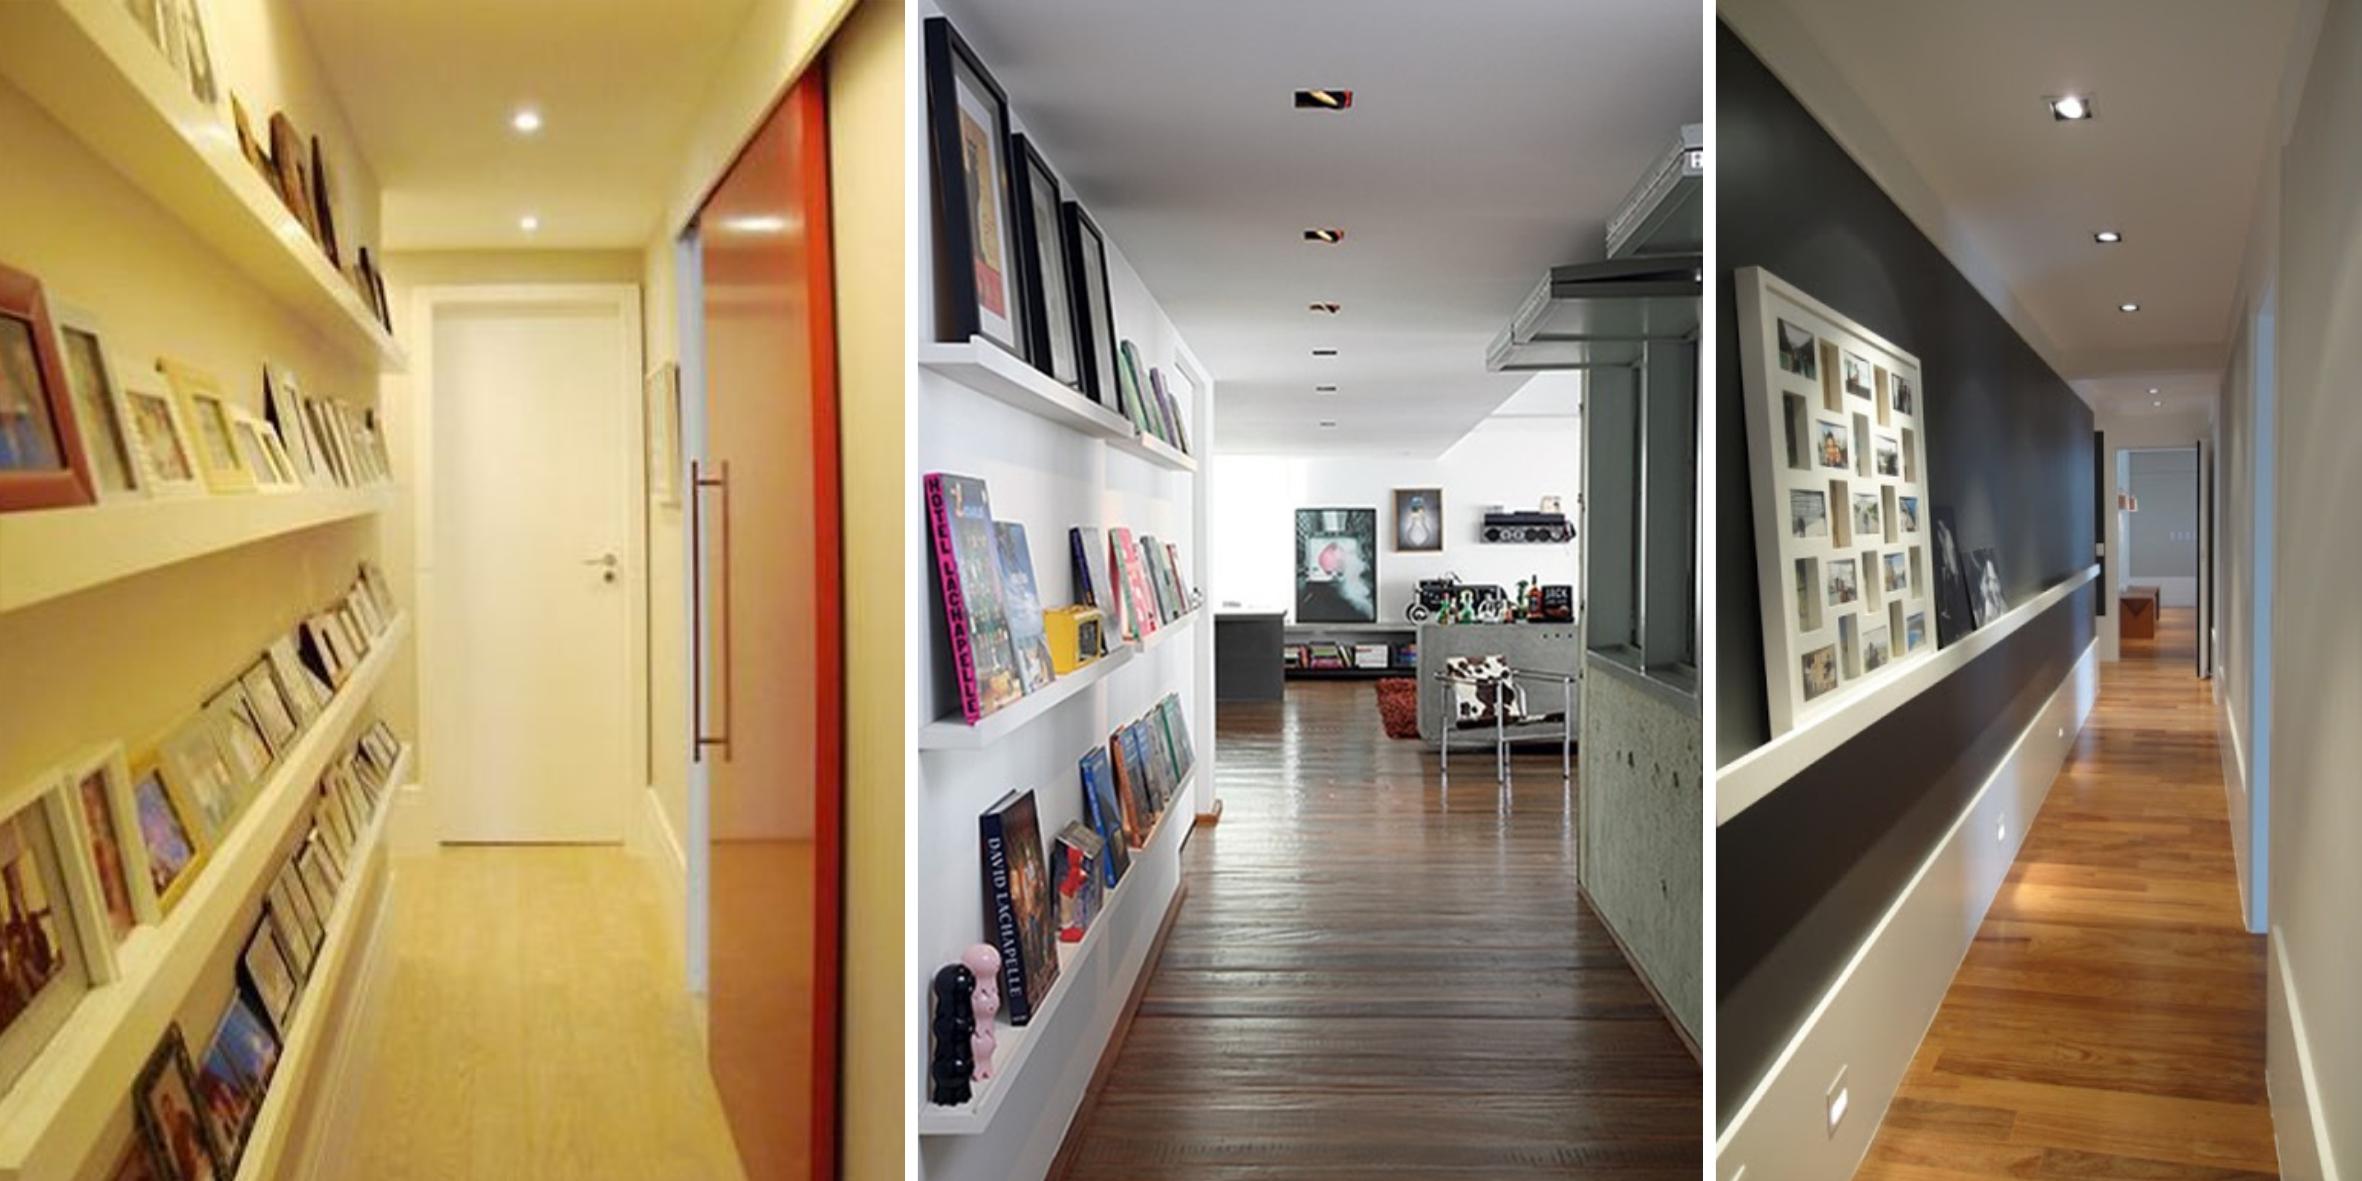 10 maneiras de transformar seu corredor it ideias for Idea de pintura de corredor